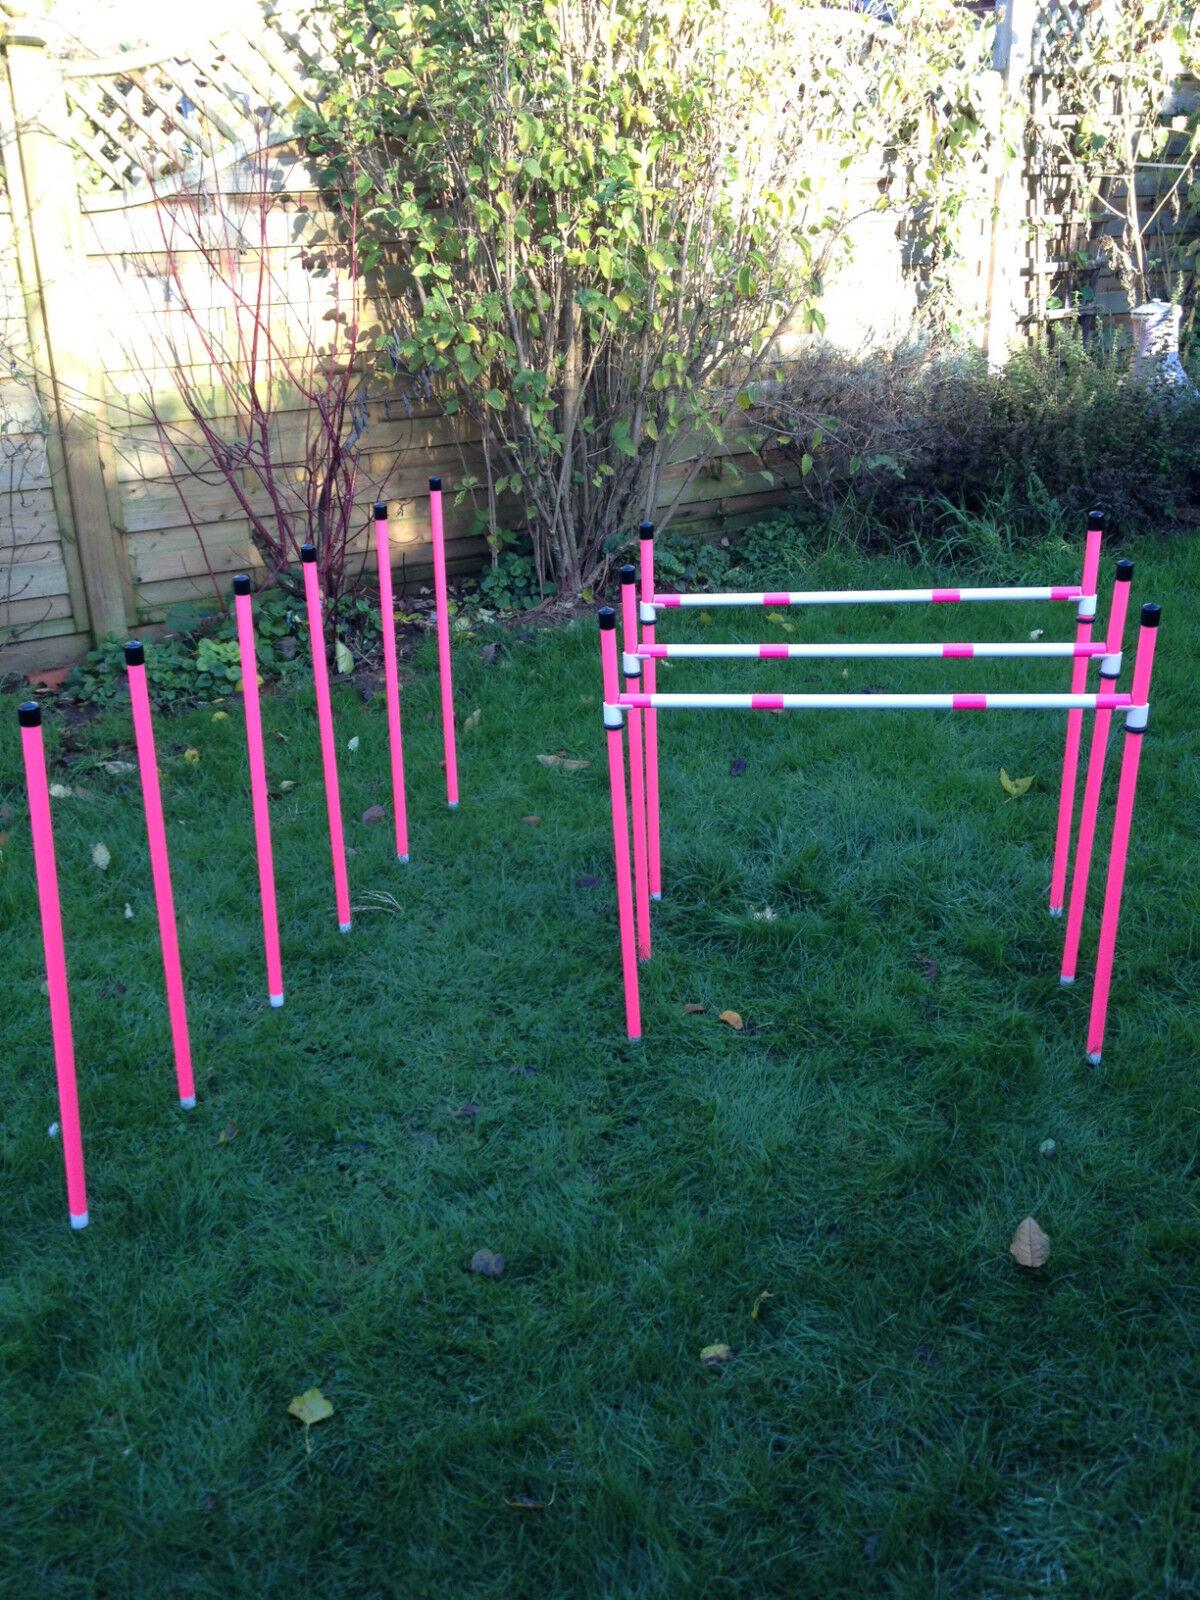 Dog Agility Basic Sliding 3x Jump & 6 Pole Weave Set by Jessejump Agility